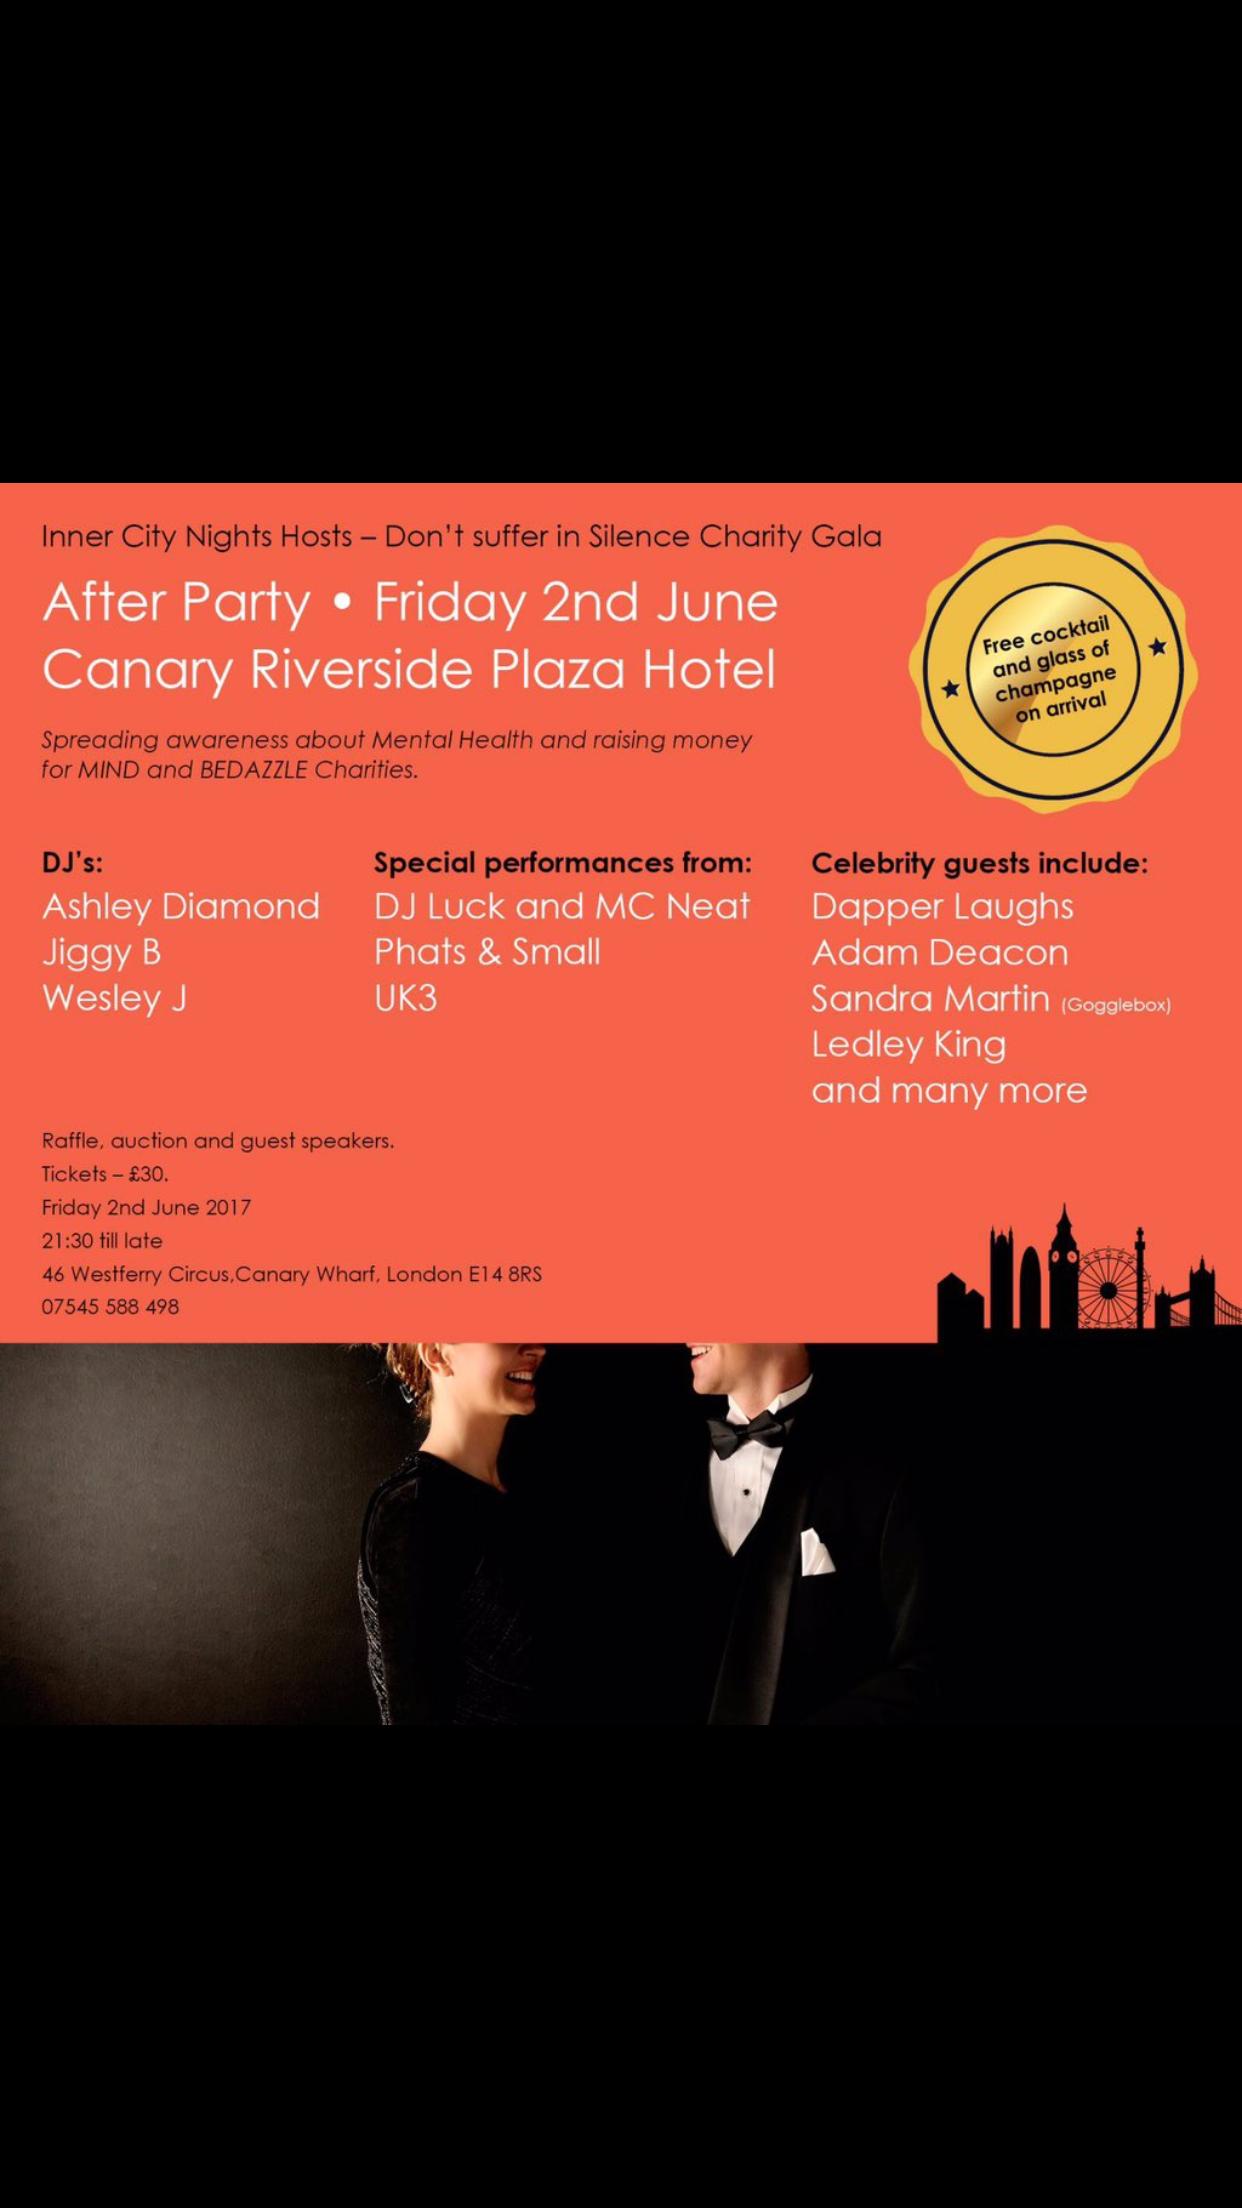 DJ LUCK & MC NEAT plus PHATS & SMALLS | London VIP Party